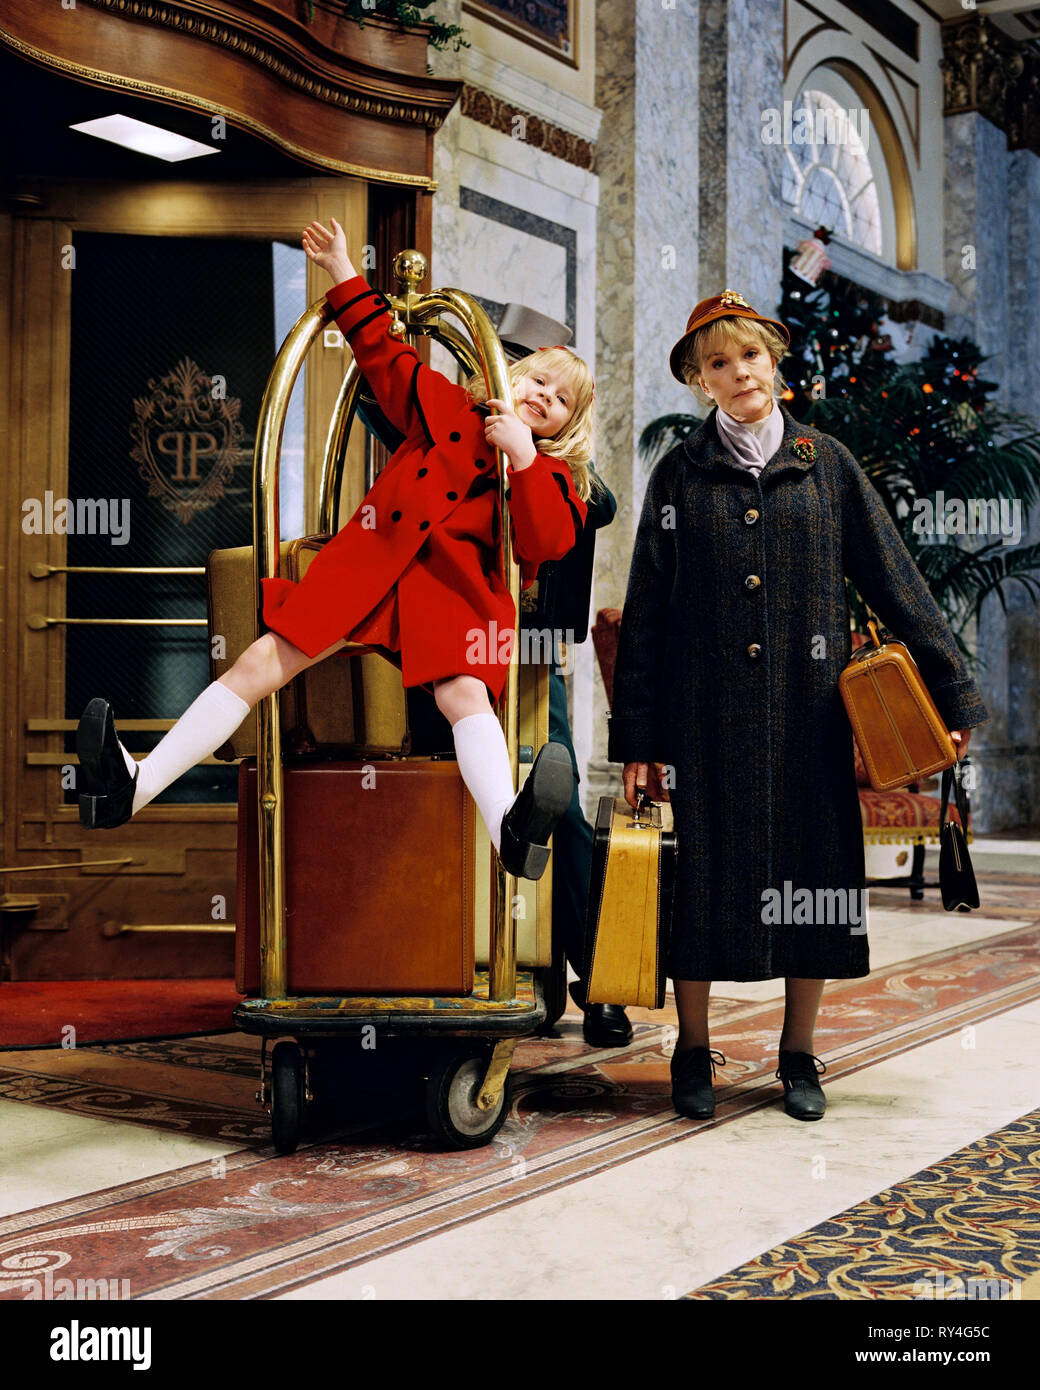 VASSILIEVA,ANDREWS, ELOISE AT CHRISTMASTIME, 2003 - Stock Image